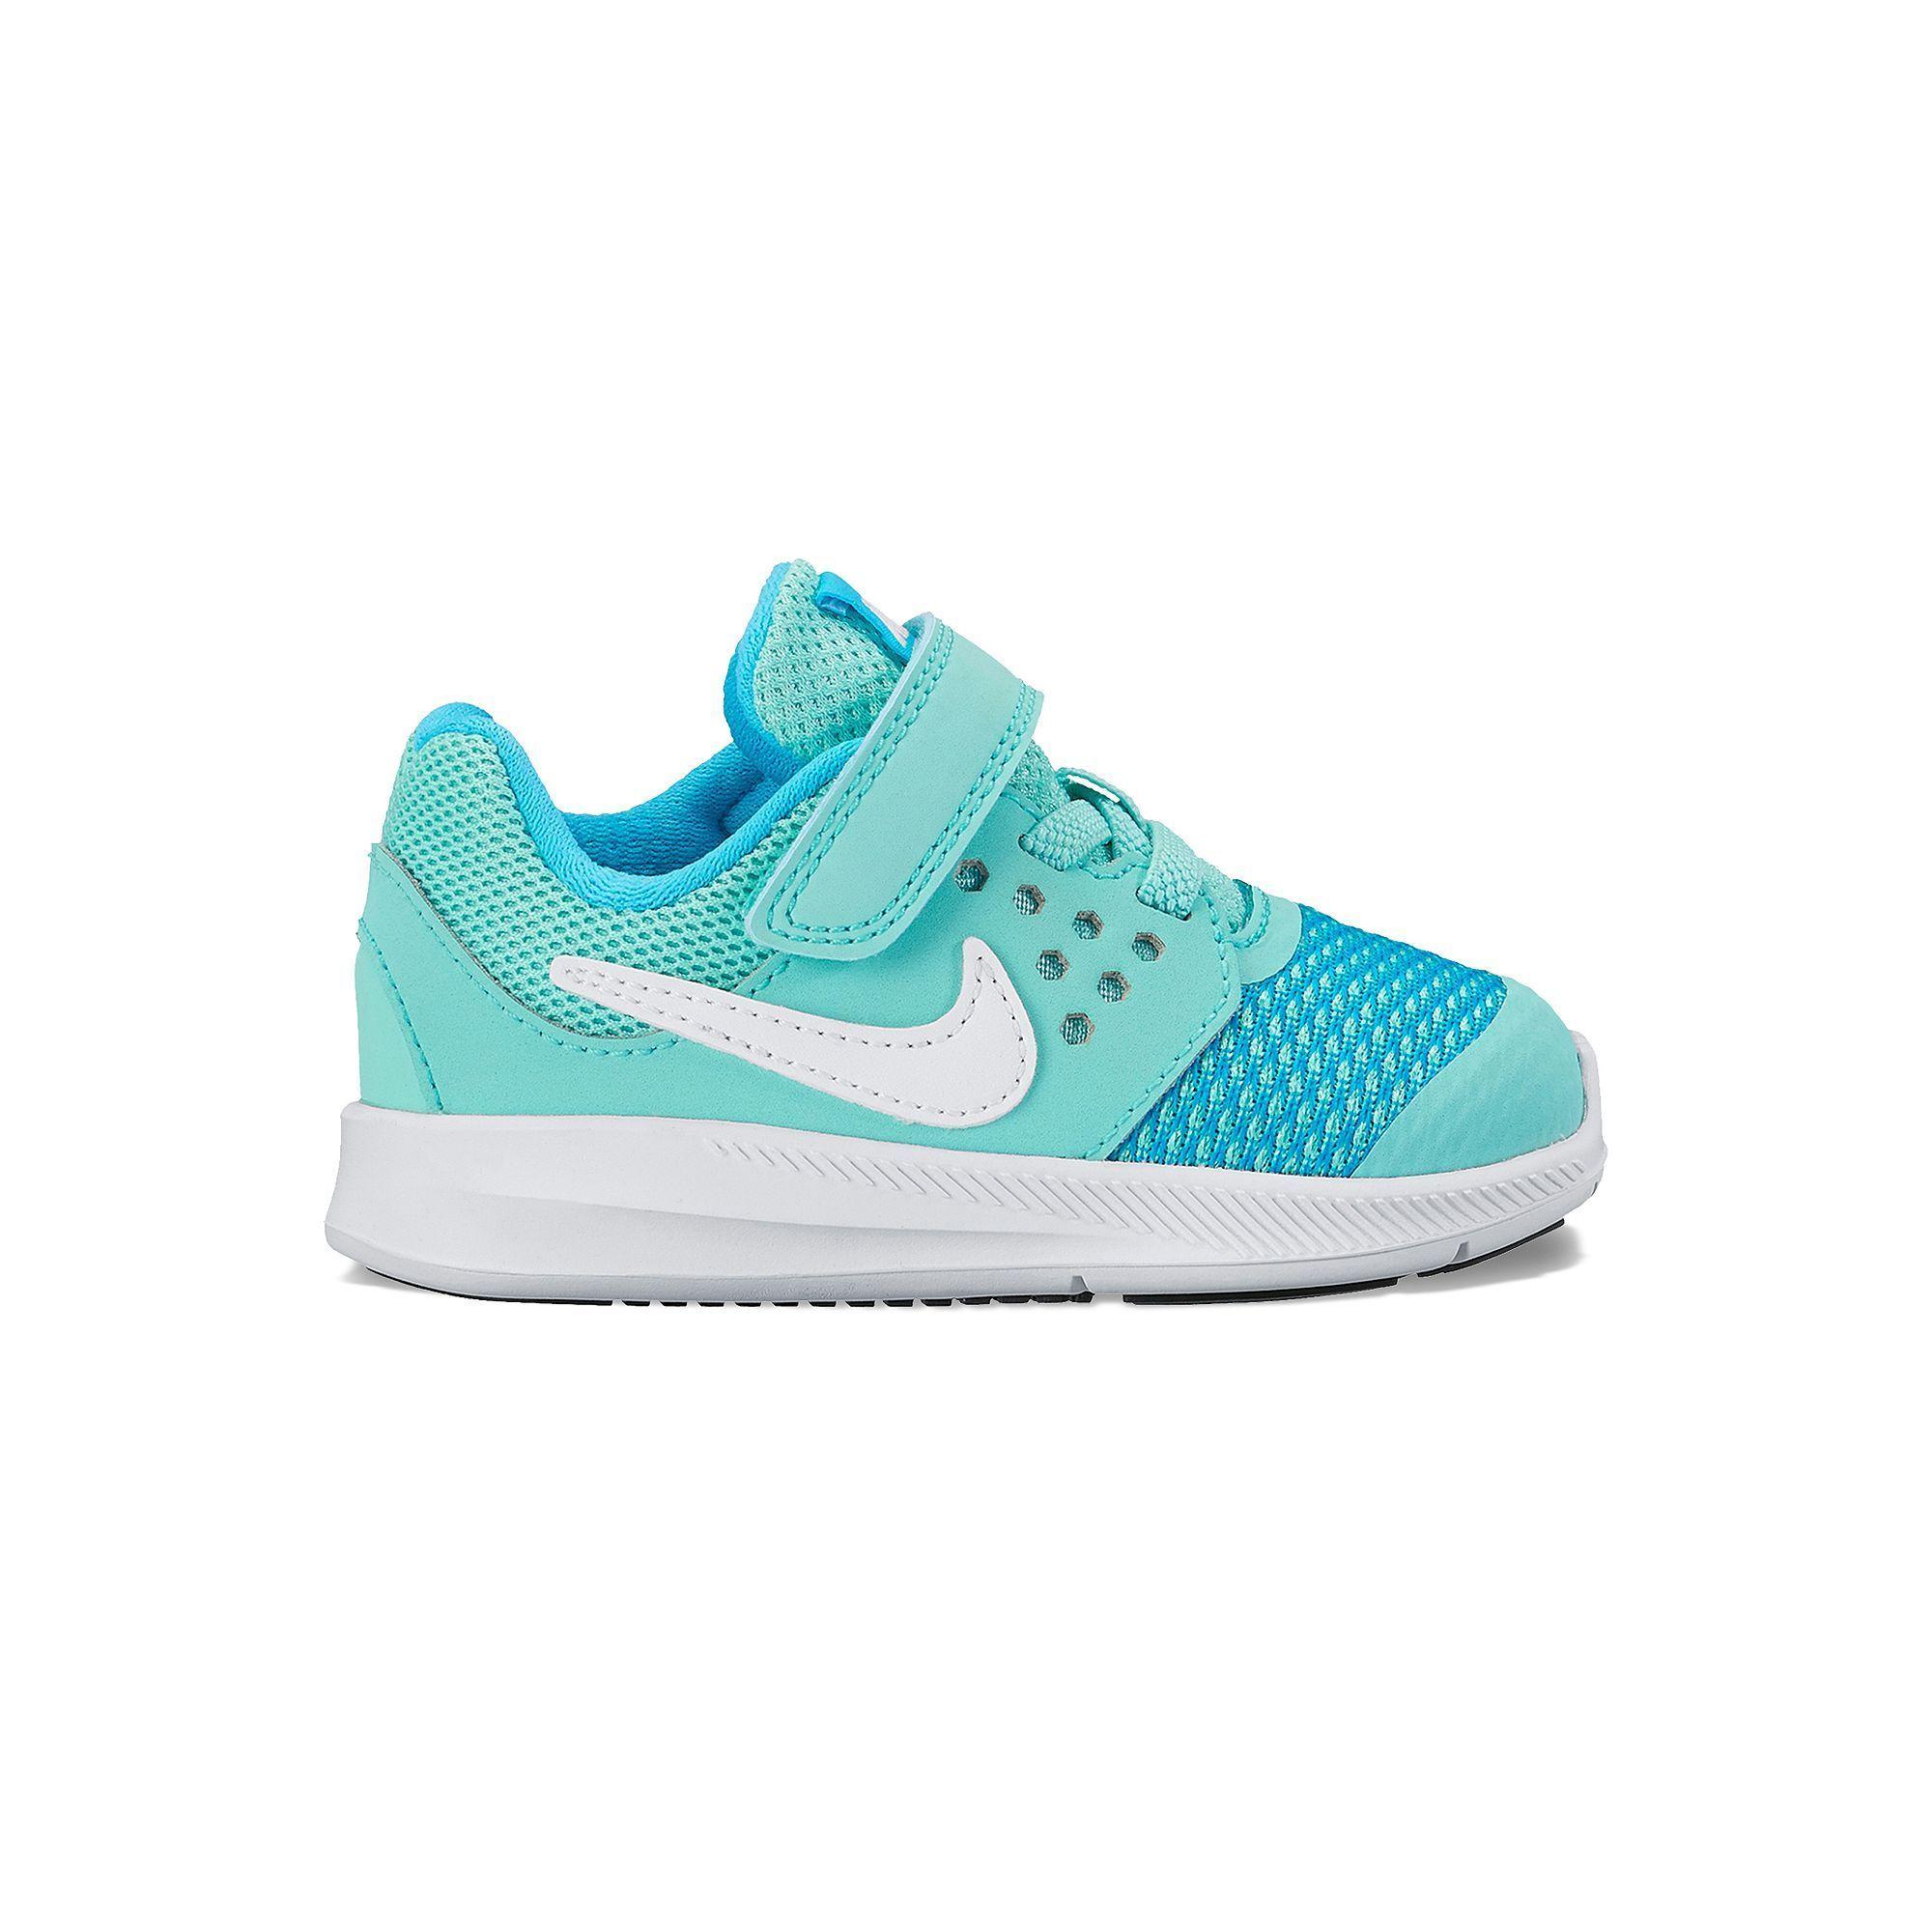 c10b27fa39 Nike Downshifter 7 Toddler Girls' Shoes, Girl's, Size: 10 T, Dark Green